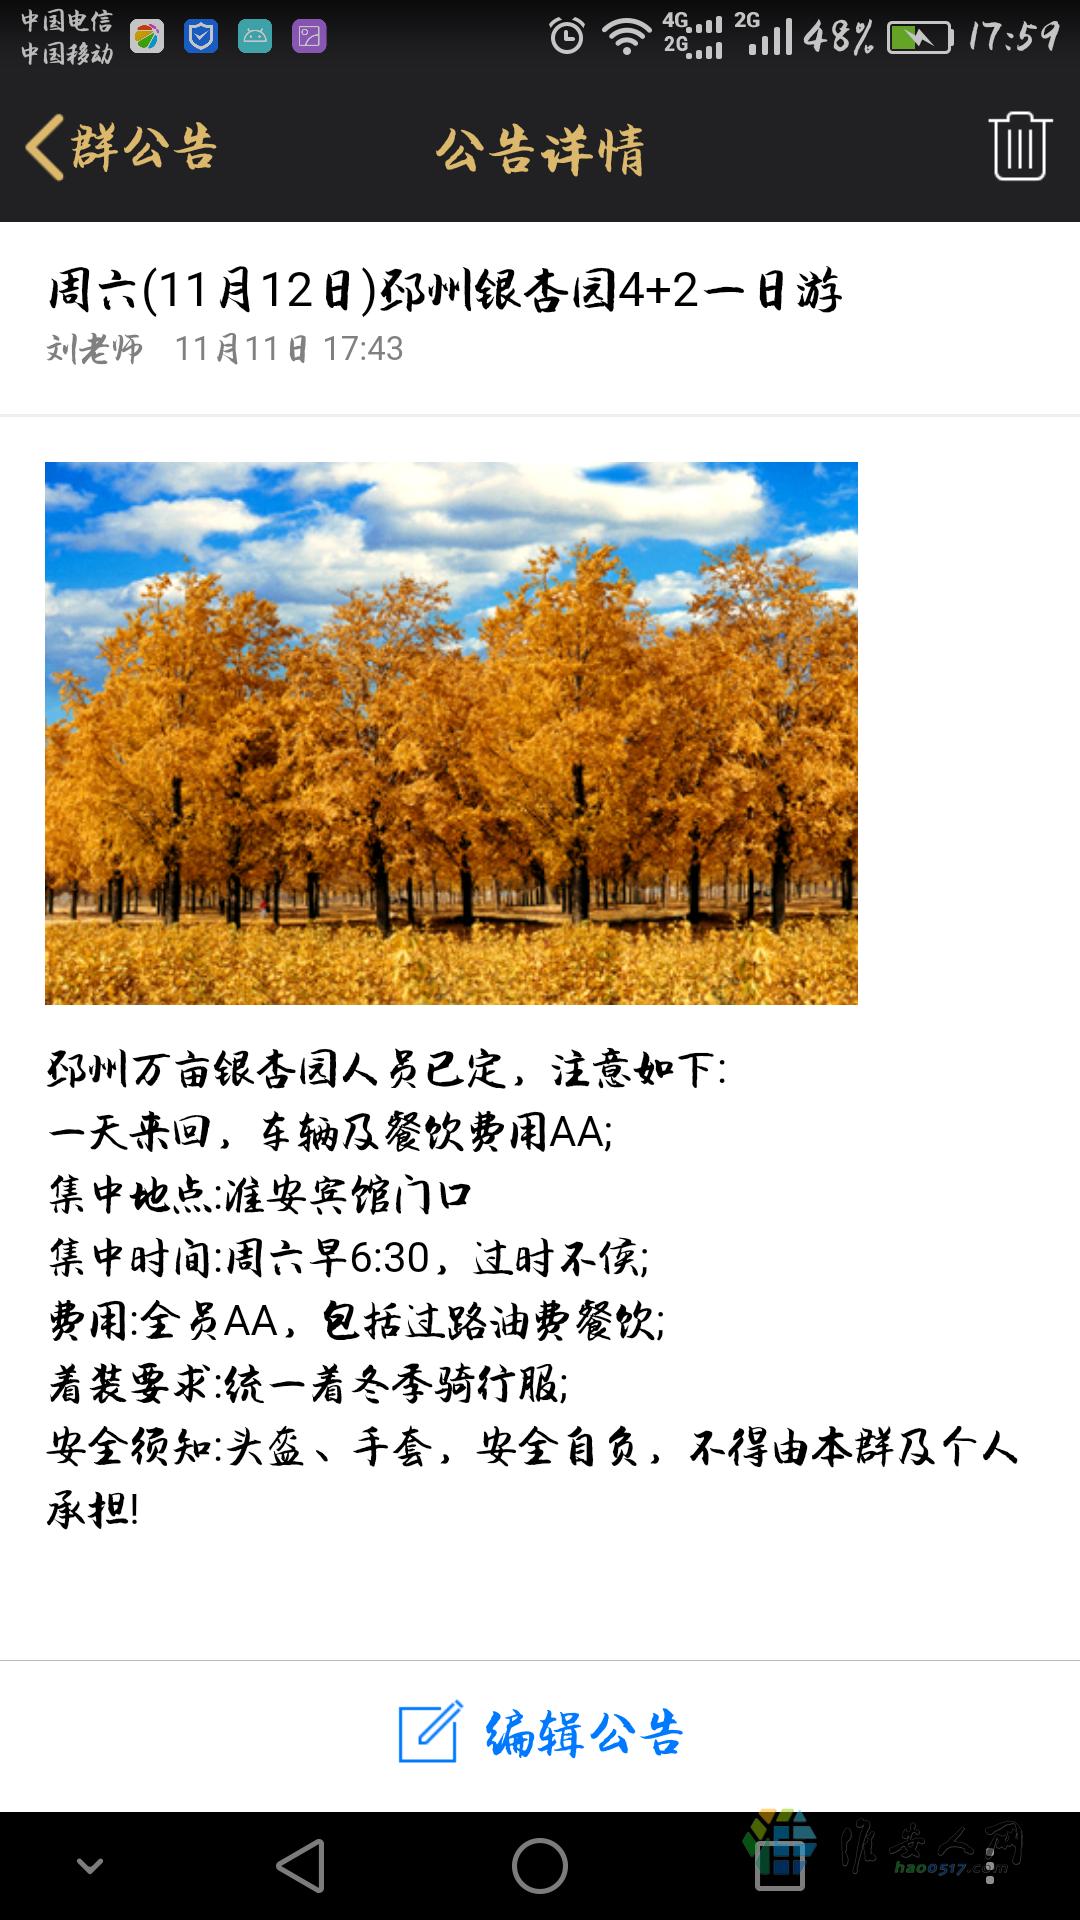 Screenshot_2016-11-13-17-59-48.png